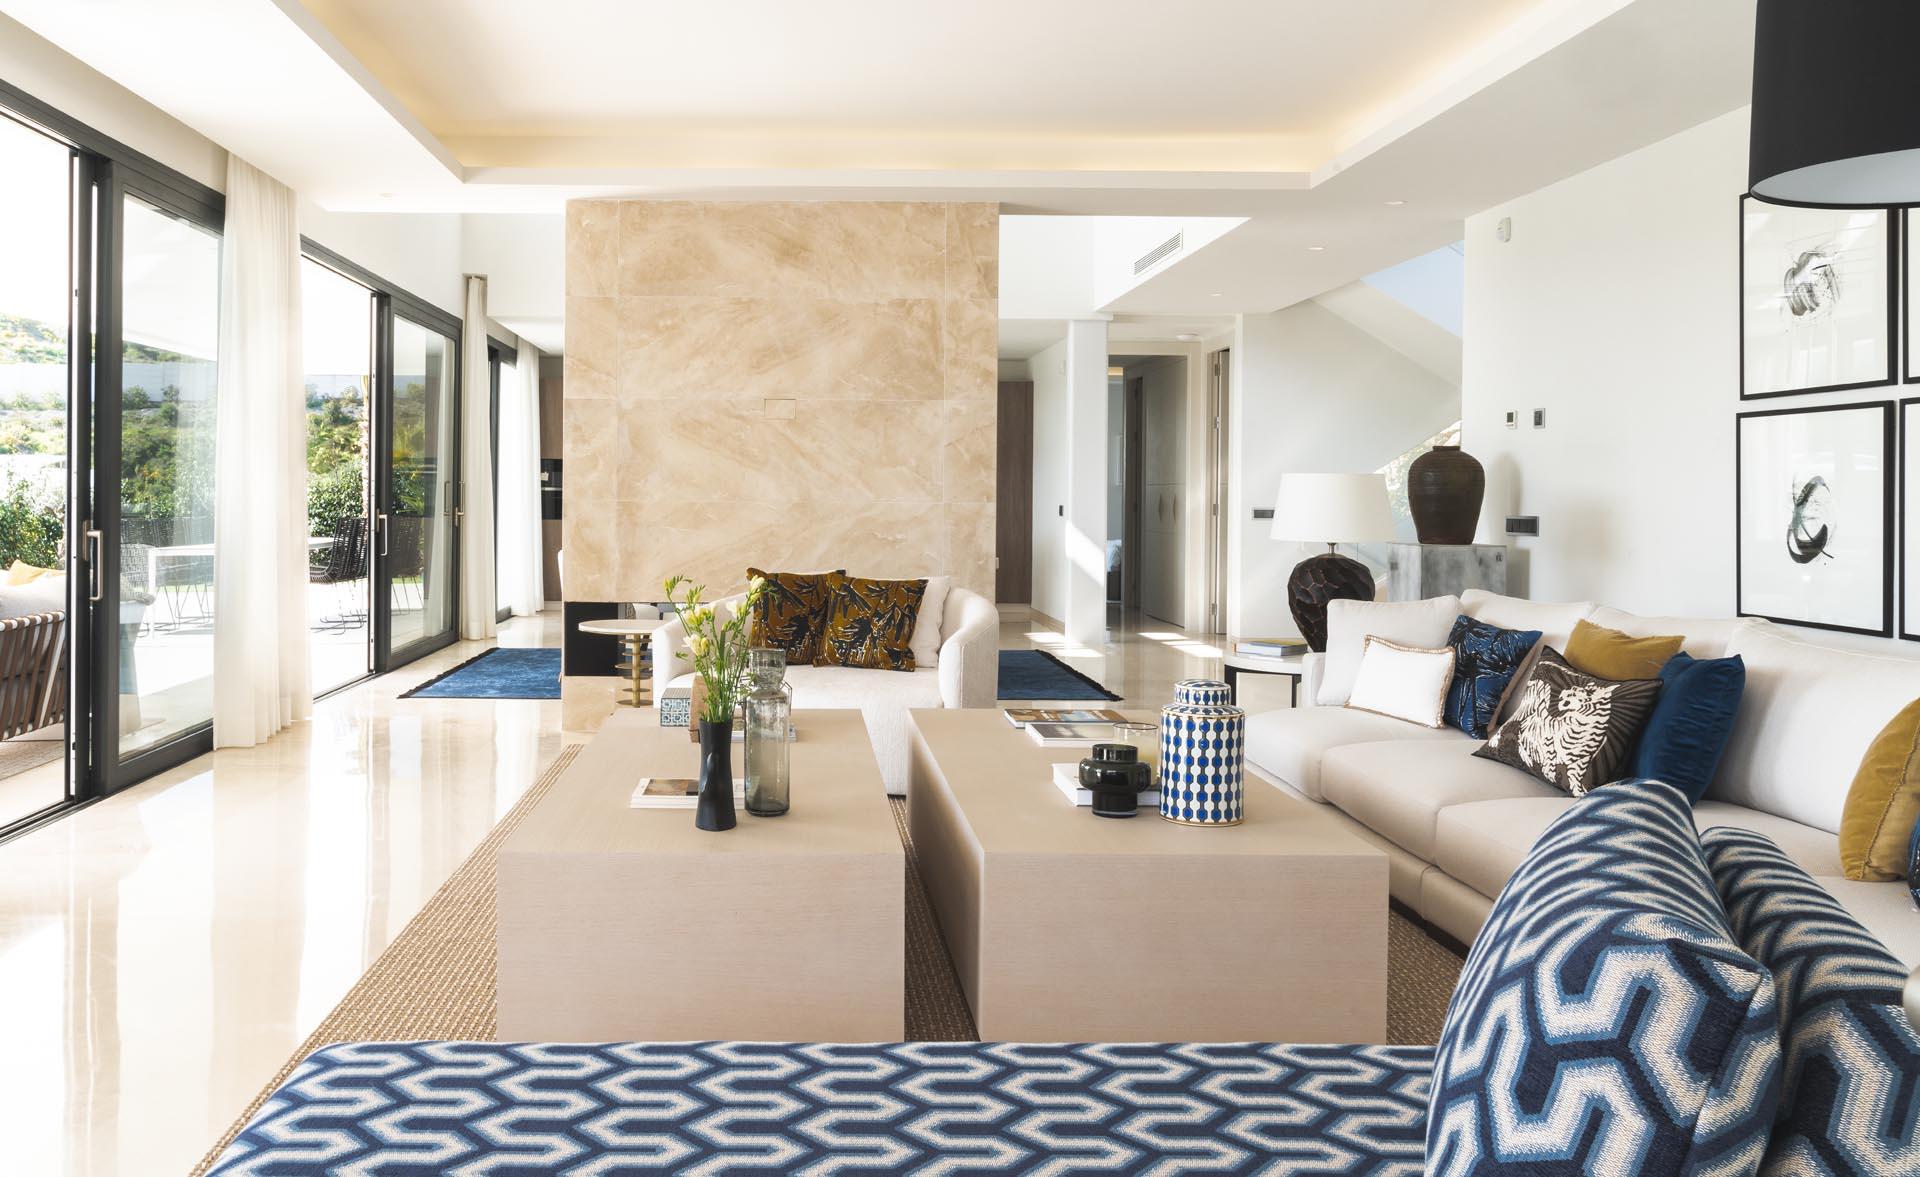 mediterranean style interior design living room details details